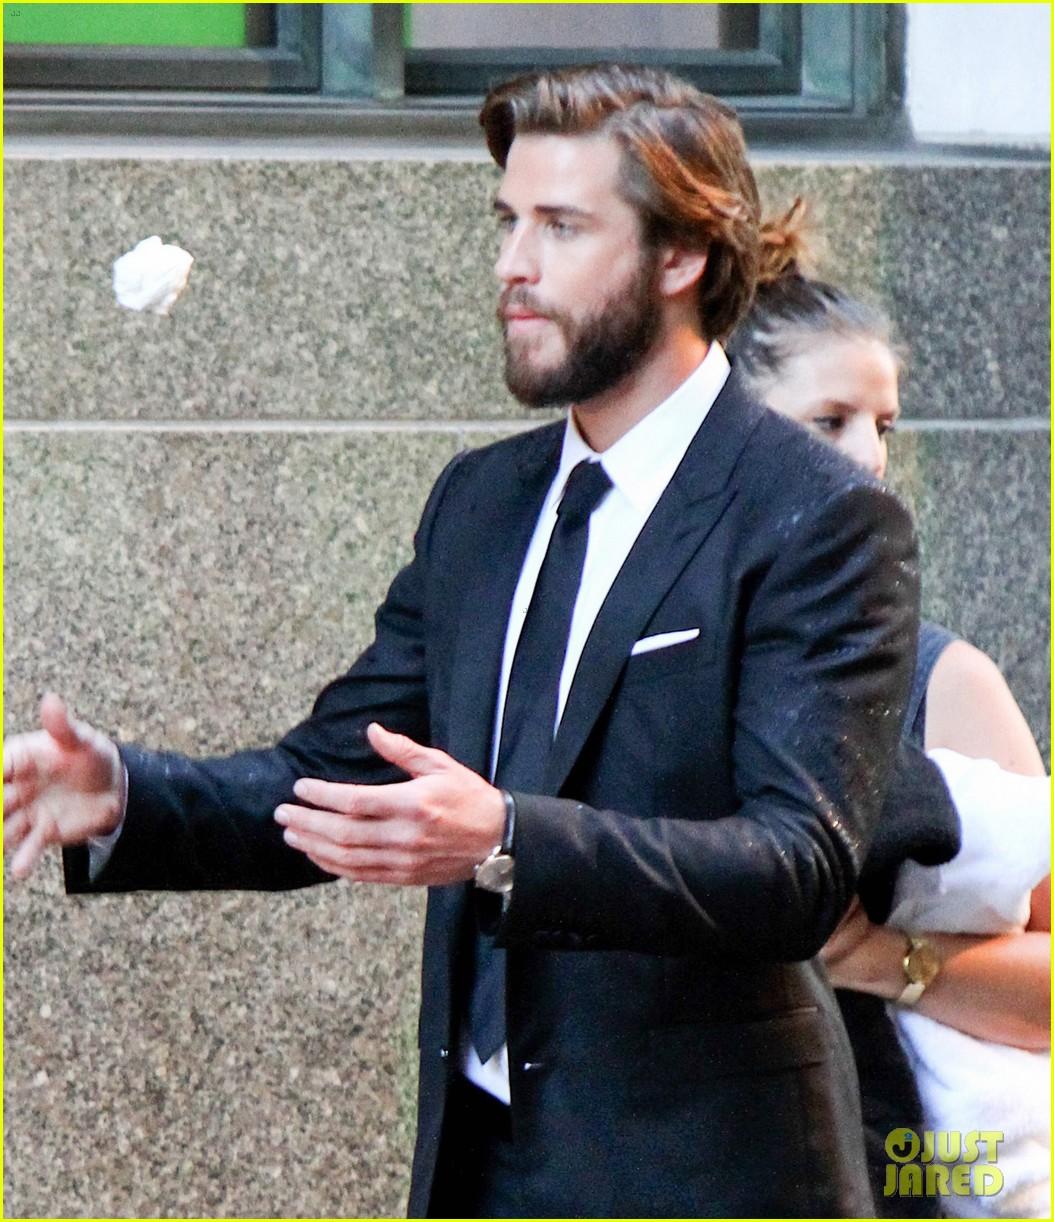 Liam Hemsworth Dawn Of A Rebel: It IS Romantic! Liam Hemsworth Gives Rebel Wilson A Kiss